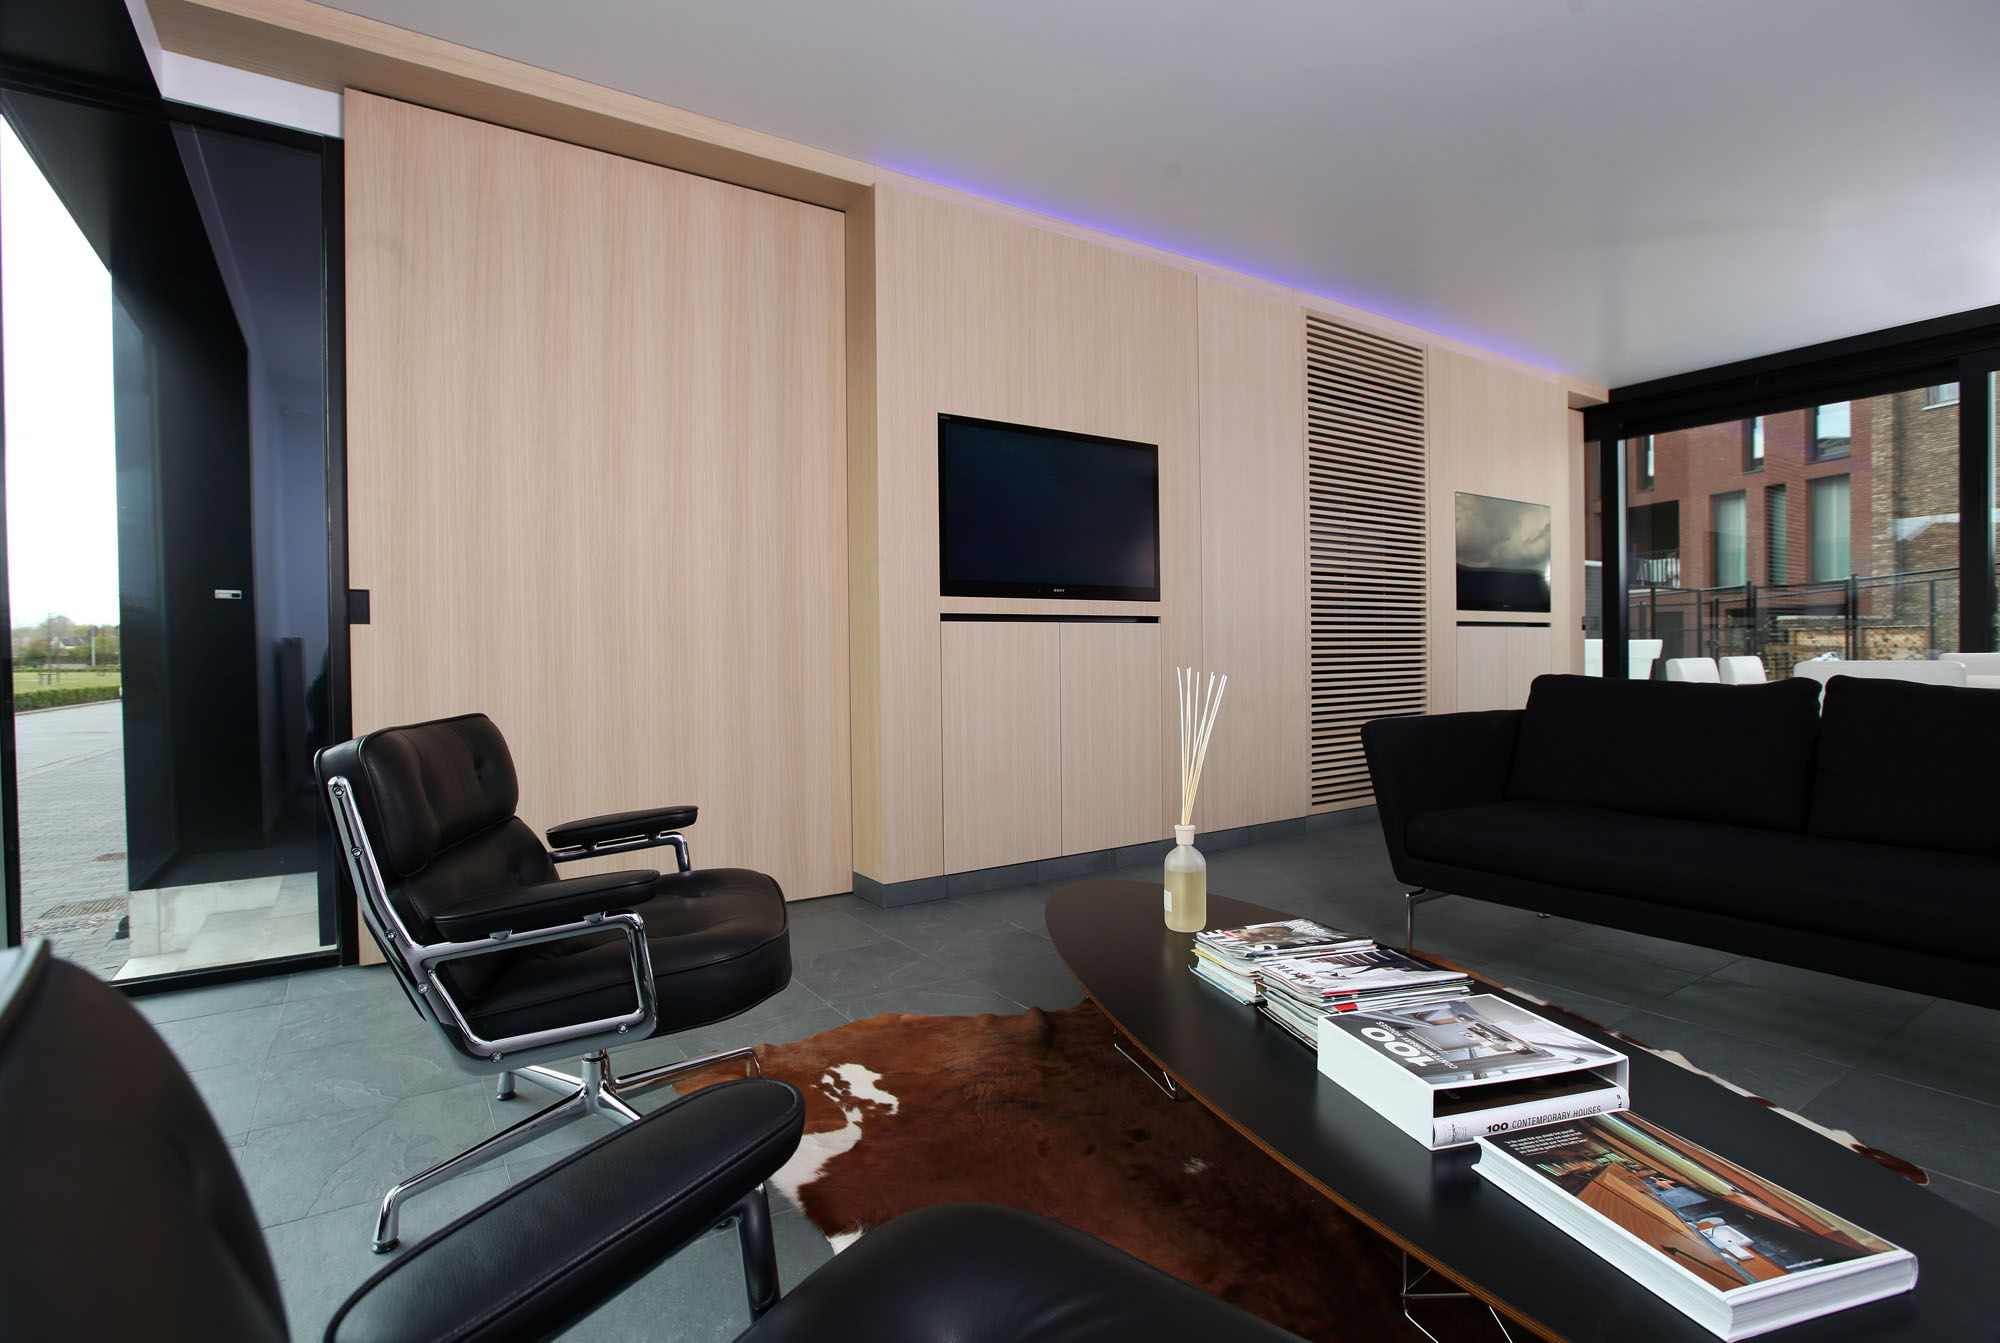 timmermans interieur kantoor inrichting designmoderninterieurkantoor hout zwart